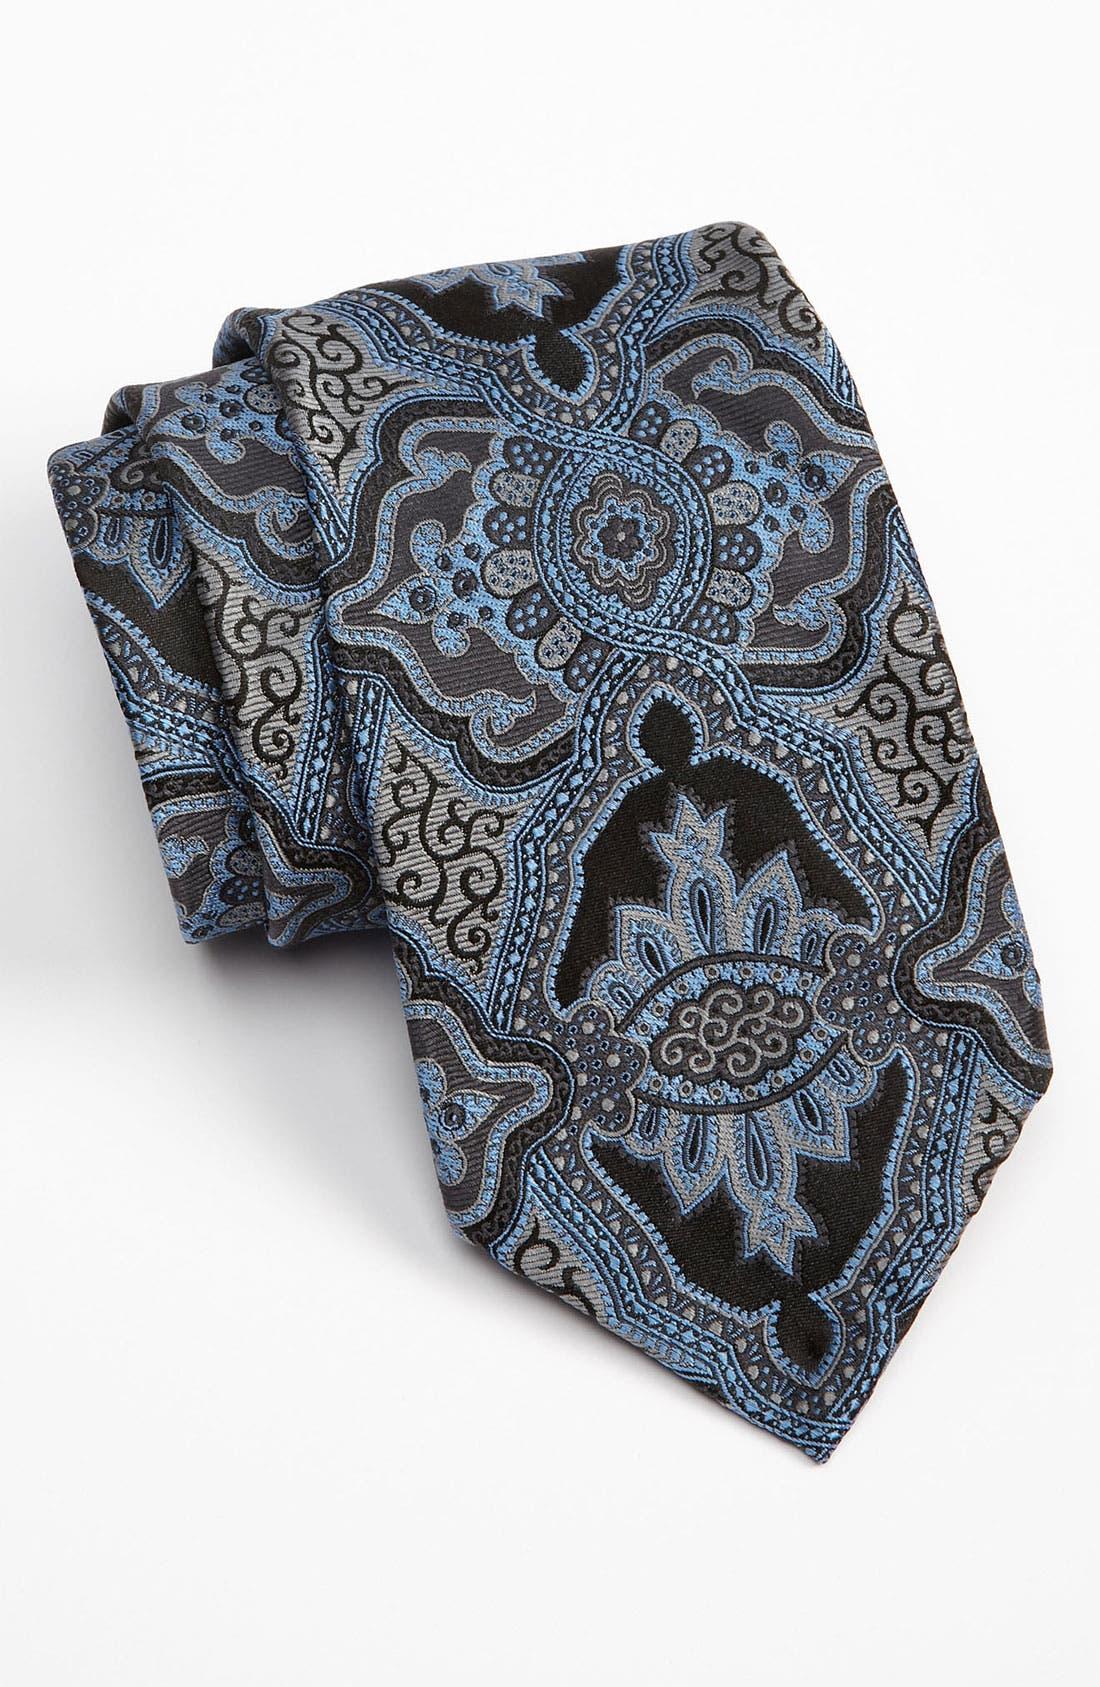 Main Image - Robert Talbott 'Sevenfold' Silk Tie (Limited Edition)